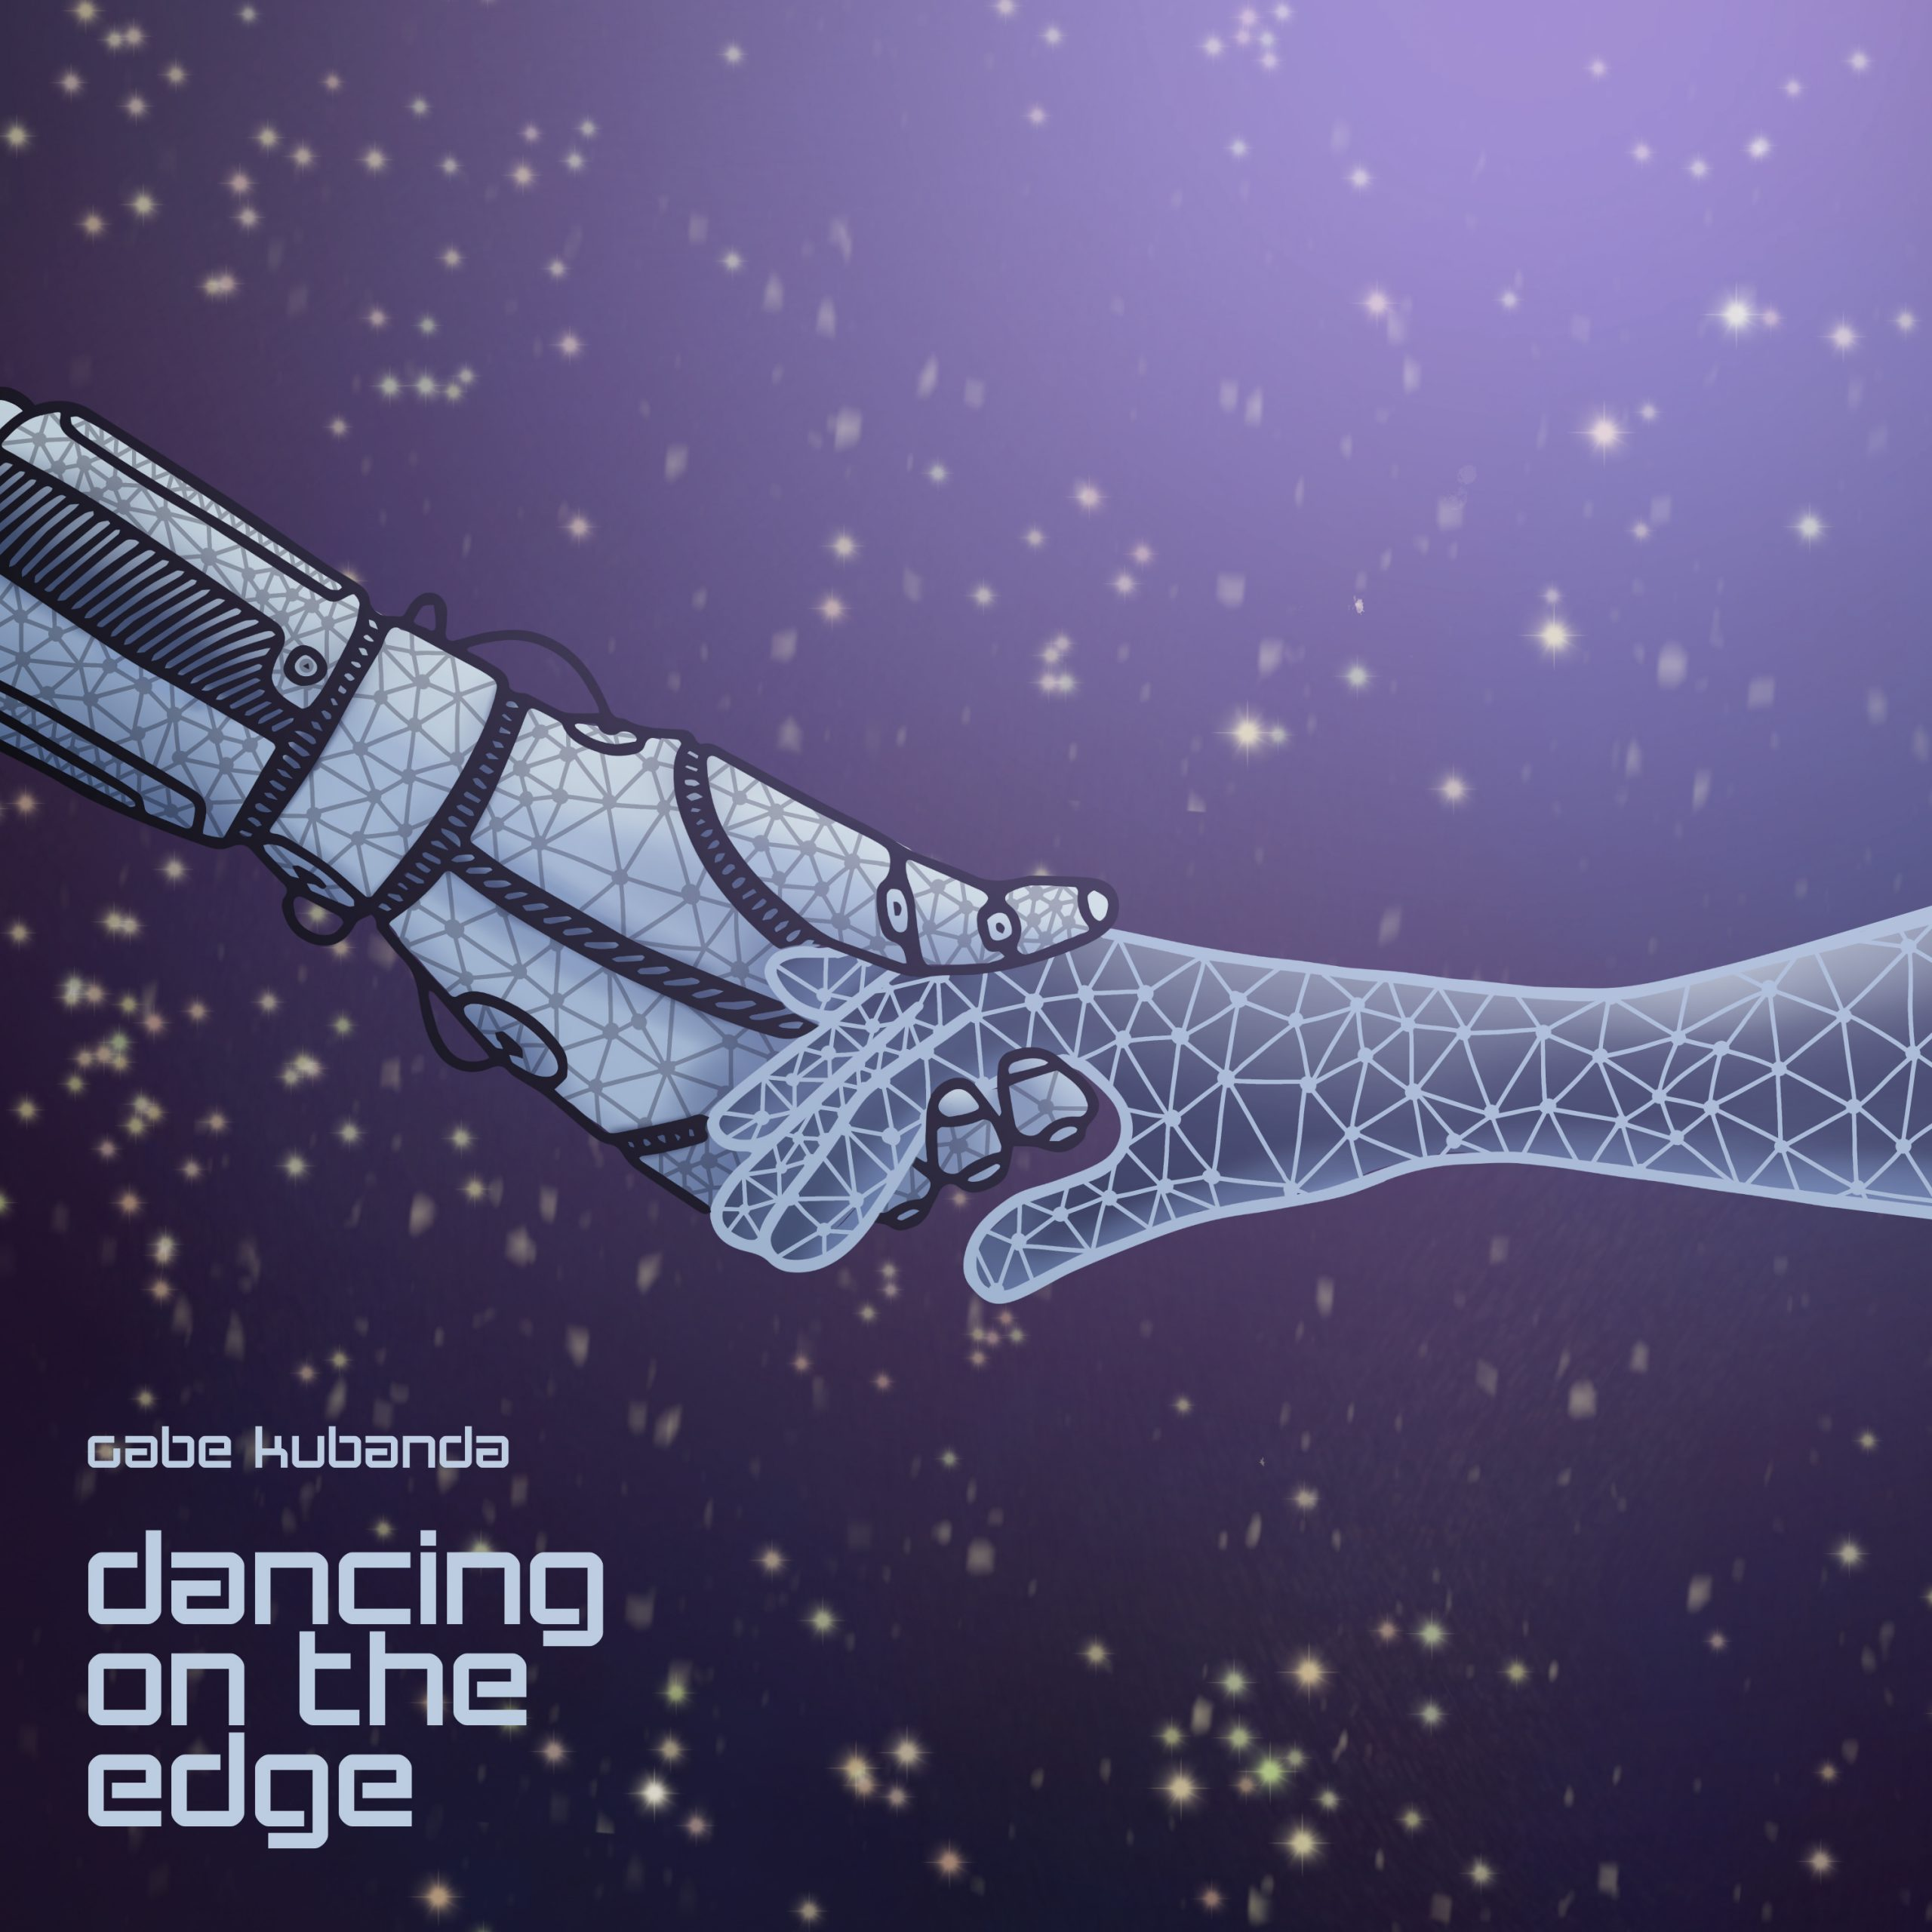 Gabe Kubanda Dancing on the Edge